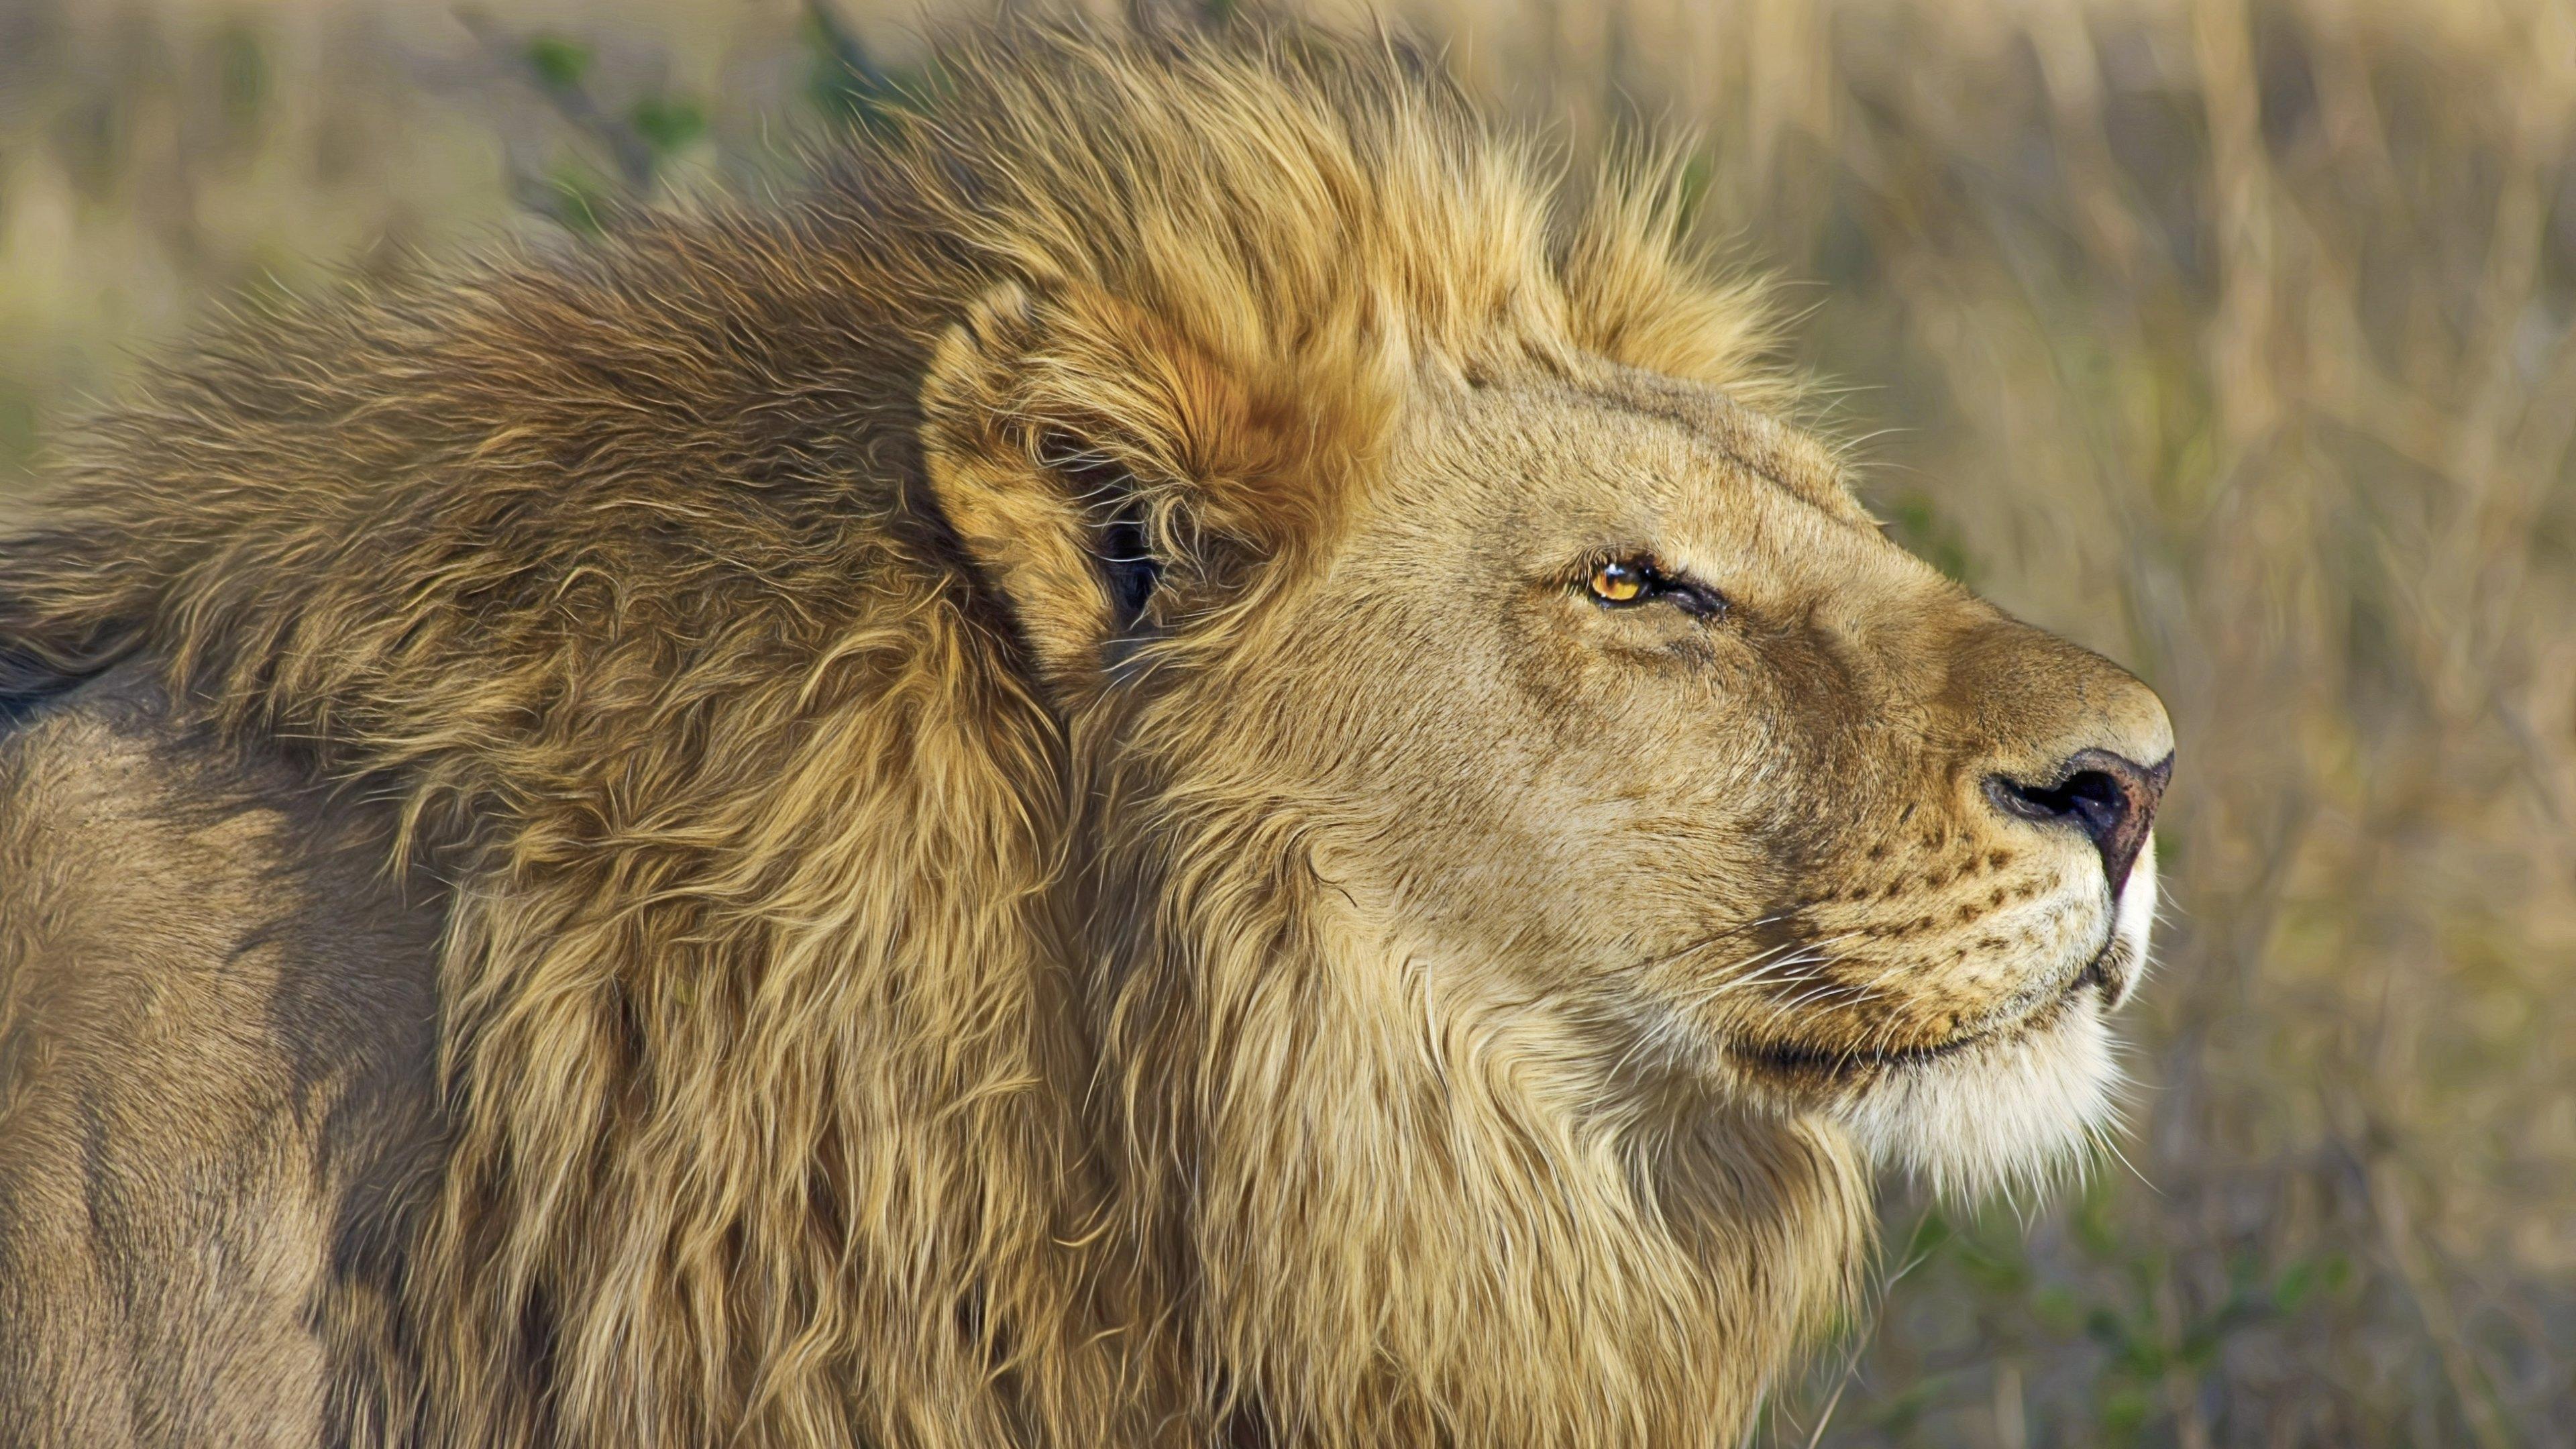 Wallpaper 5 Lion male in savanna 3840x2160